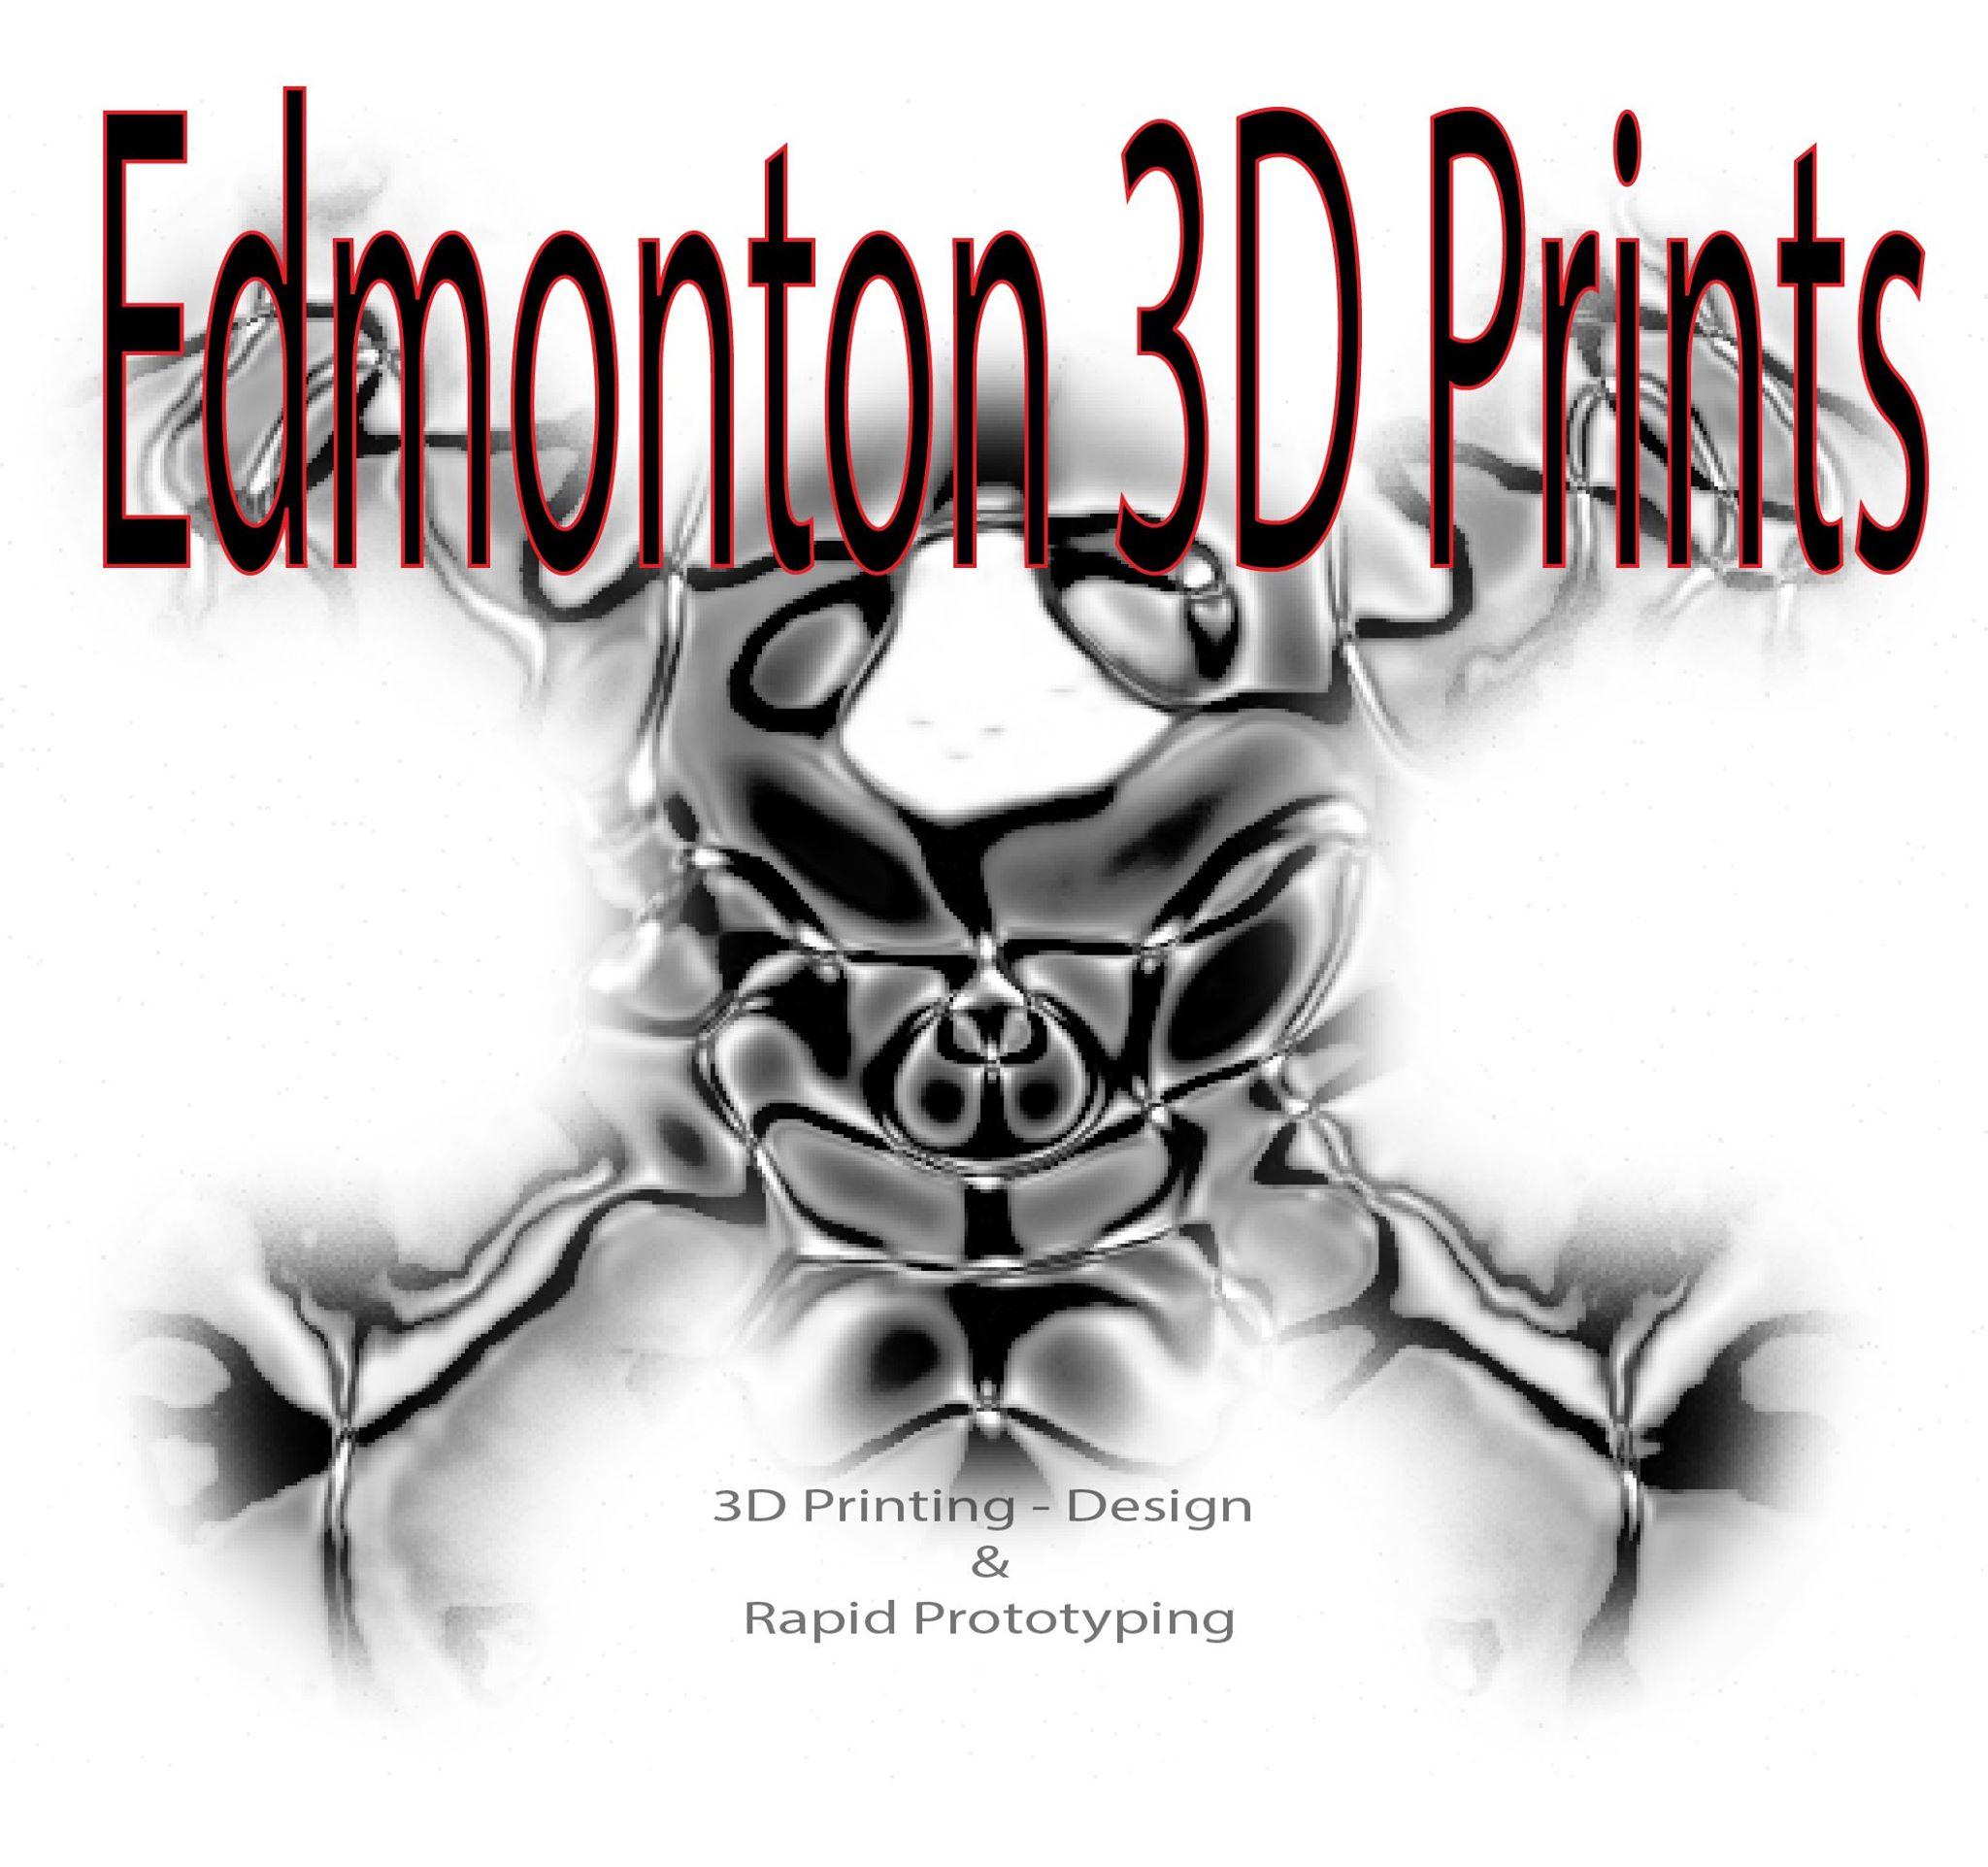 Edmonton 3D Prints